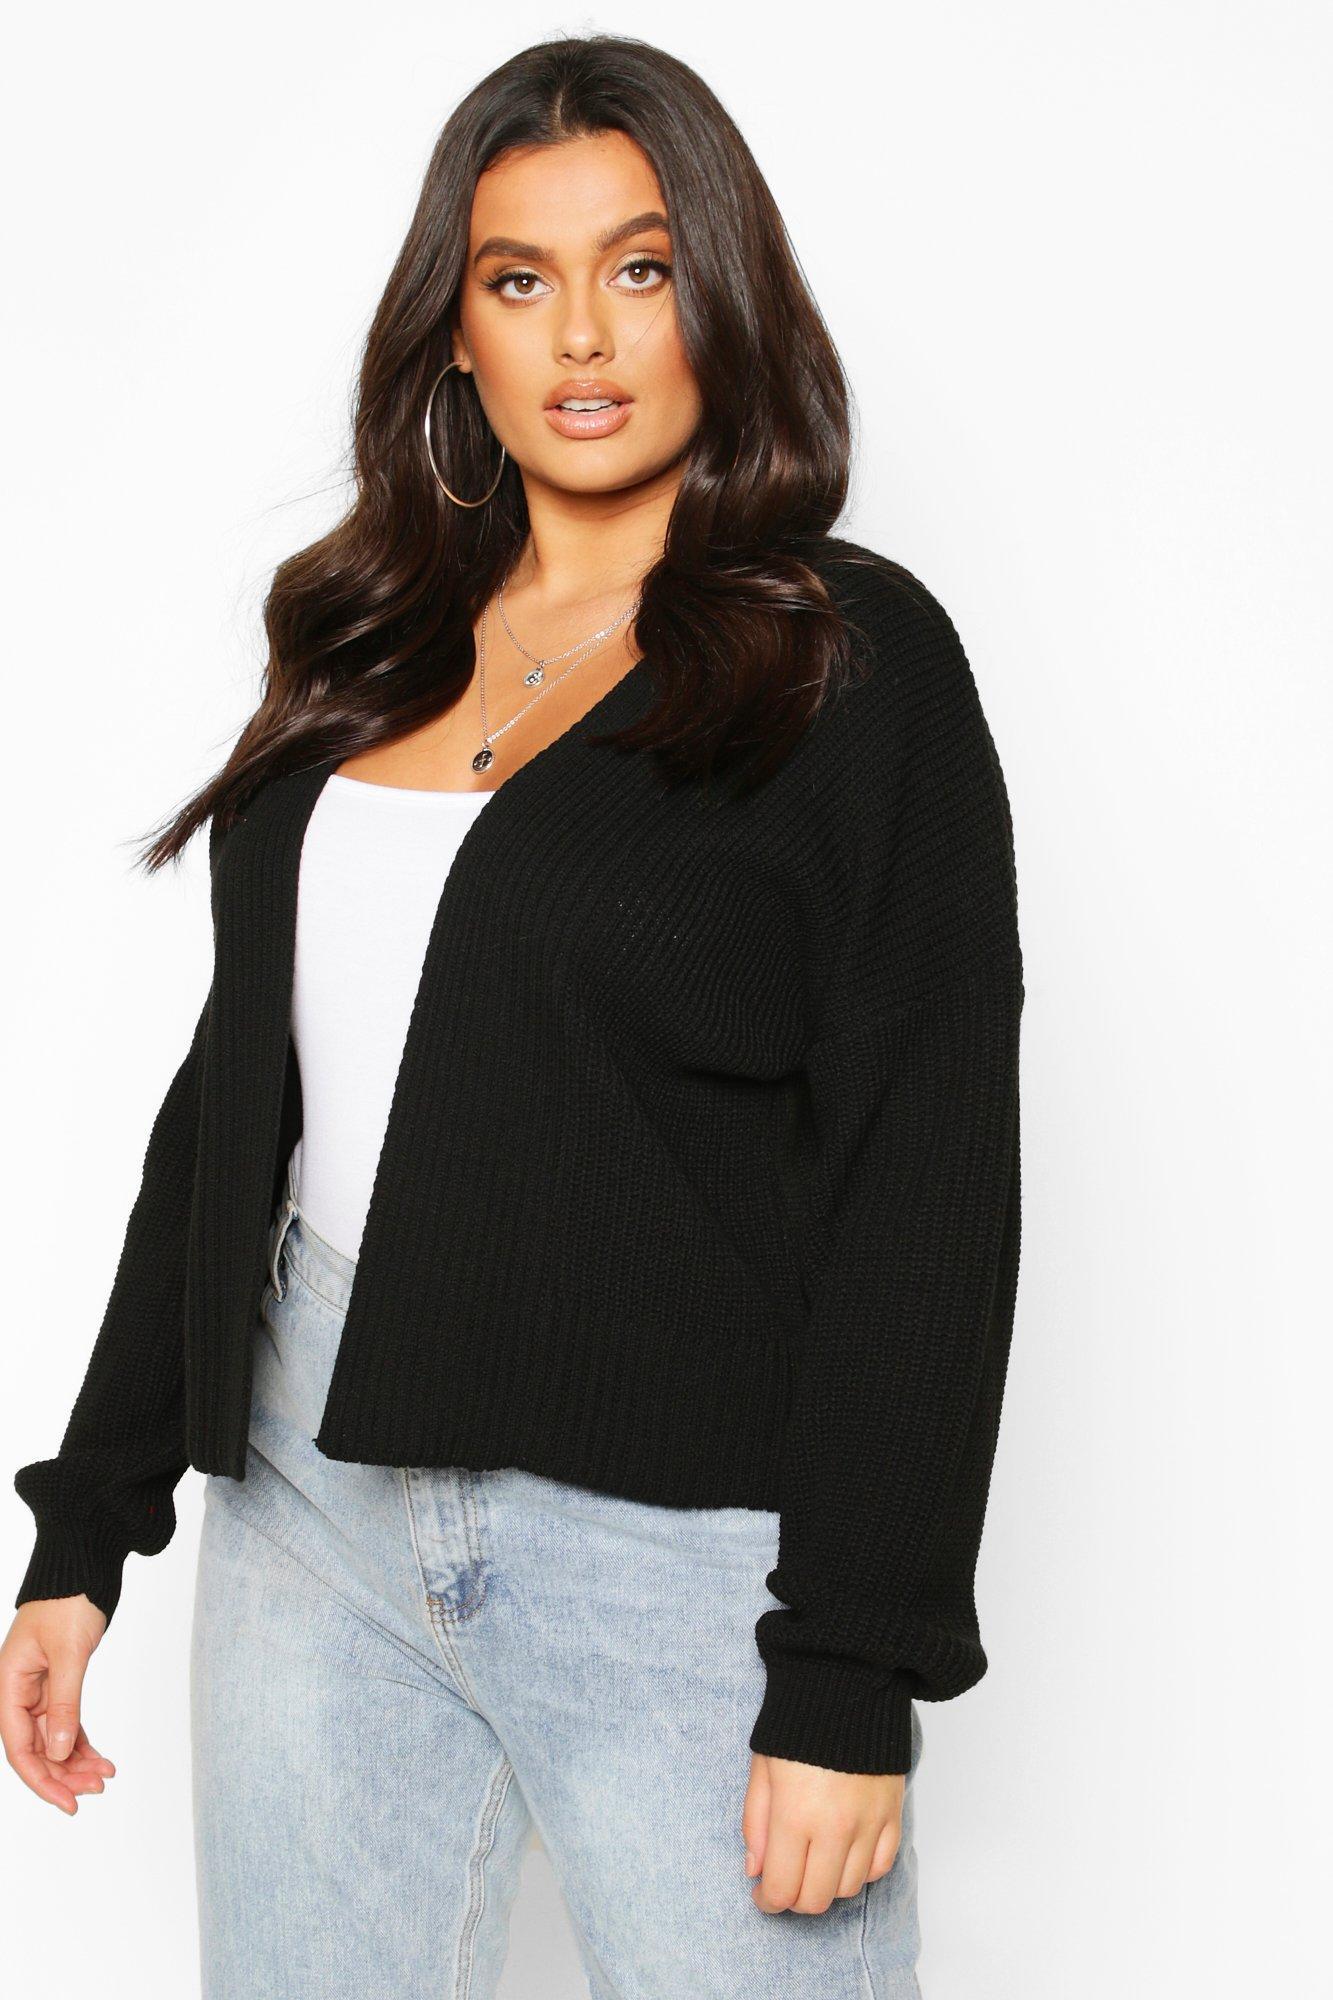 Womens Plus Cropped Cardigan - black - 42, Black - Boohoo.com